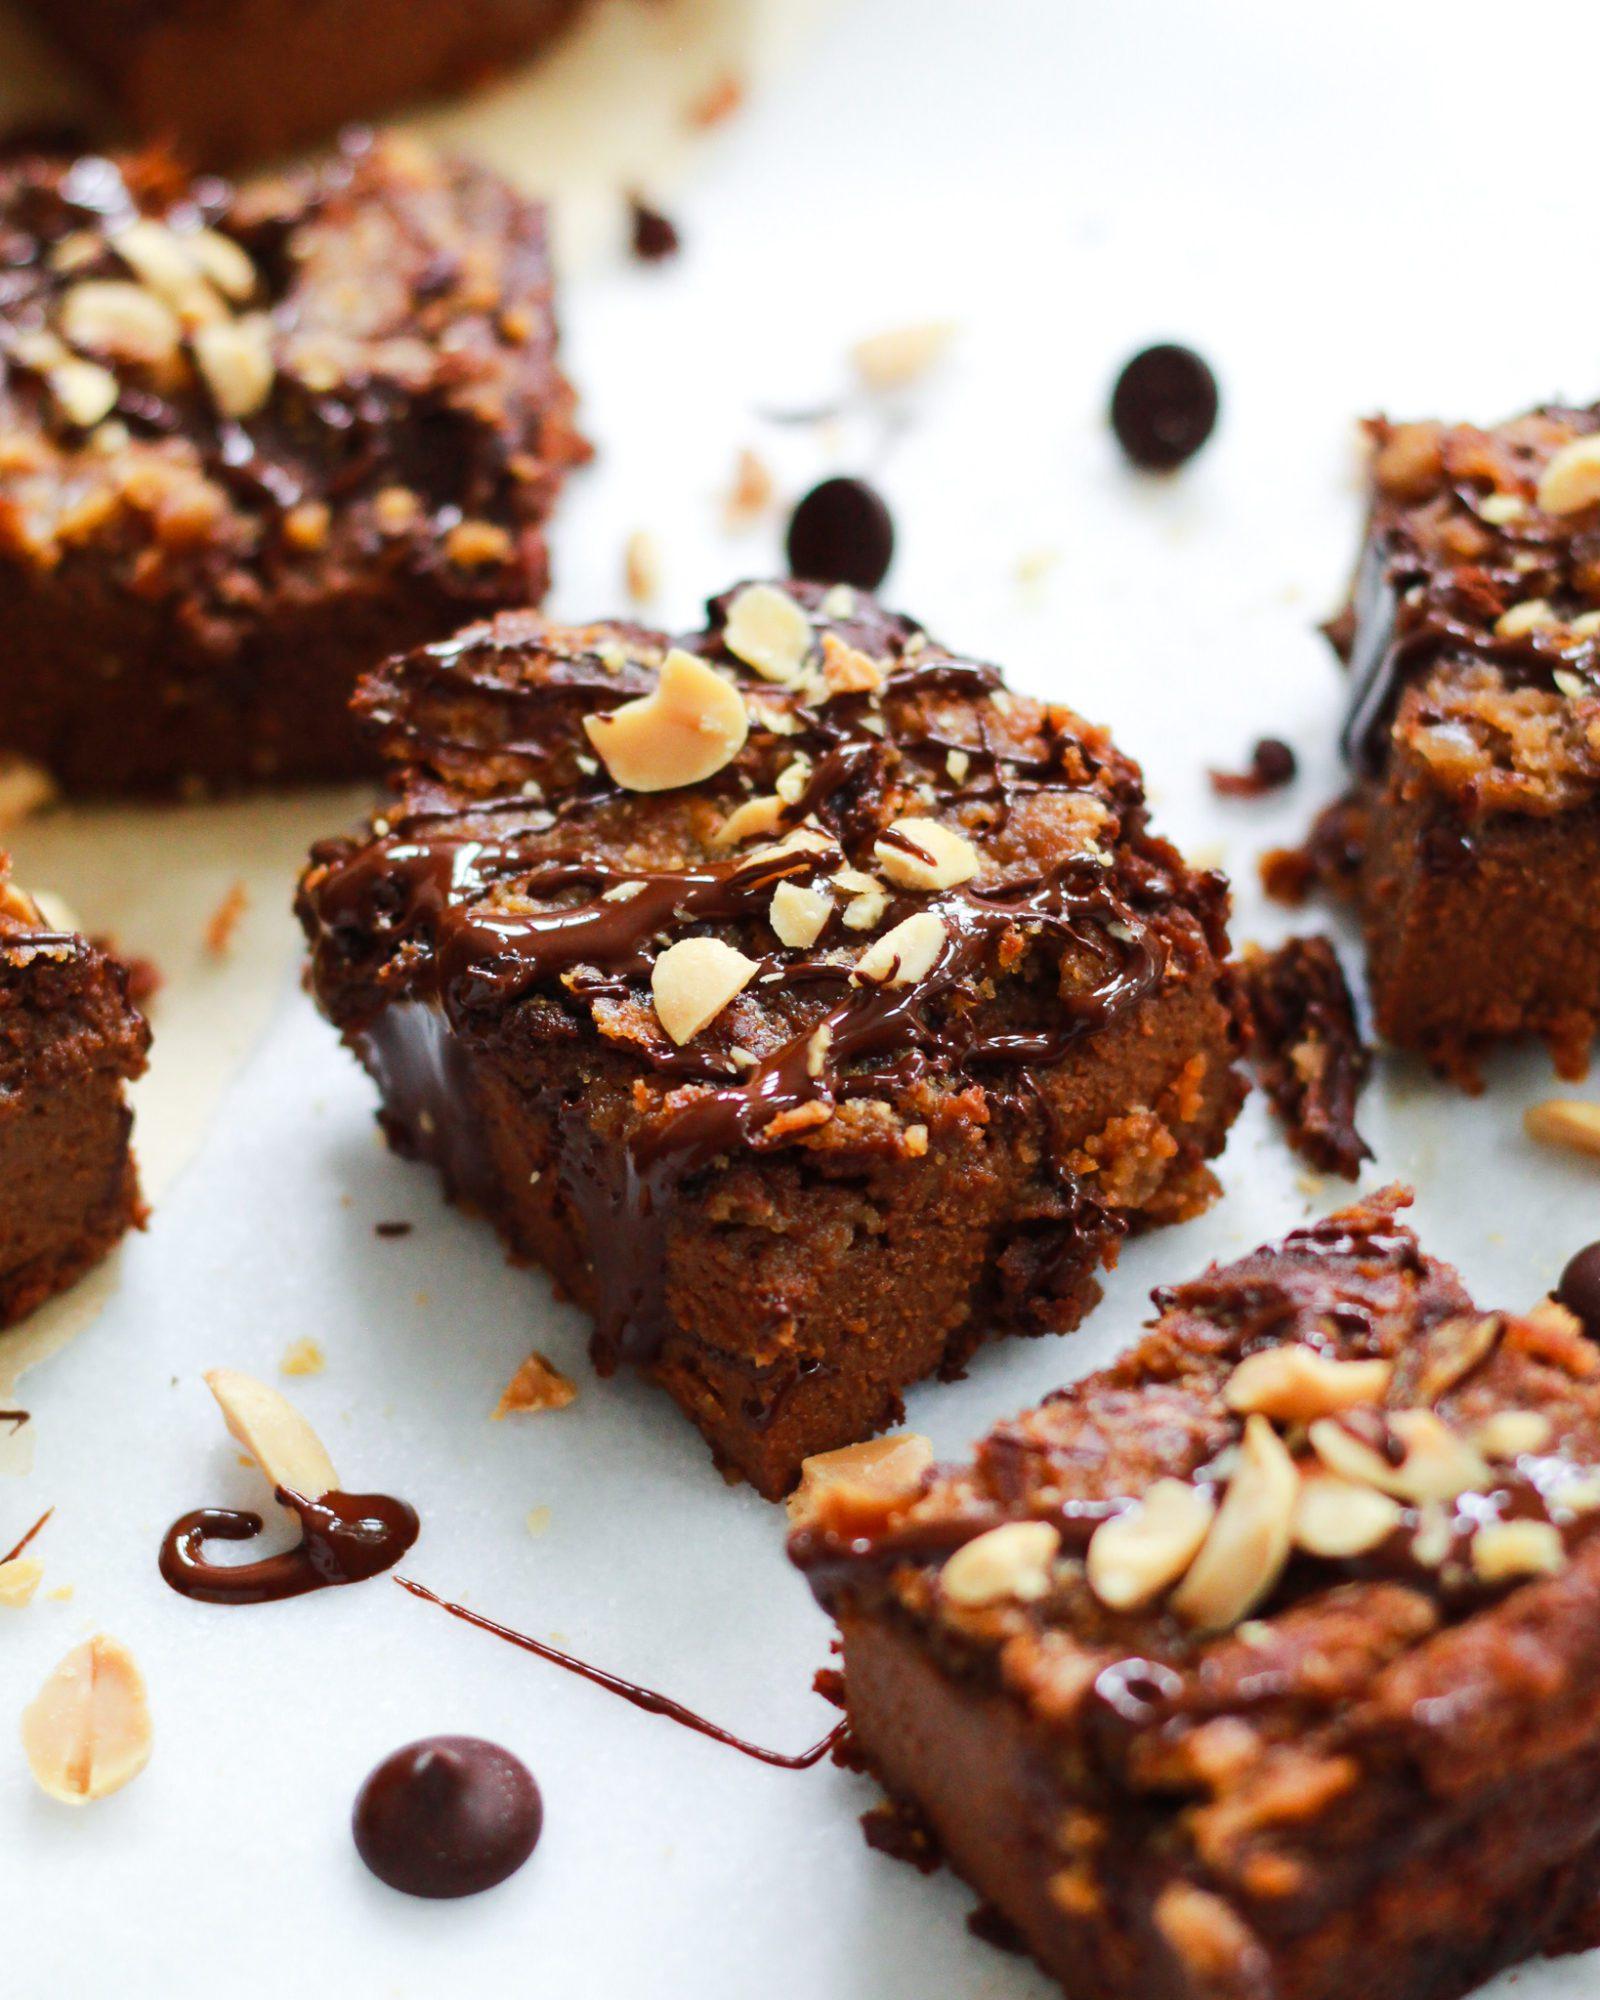 vegan peanut butter swirl brownie drizzled in chocolate